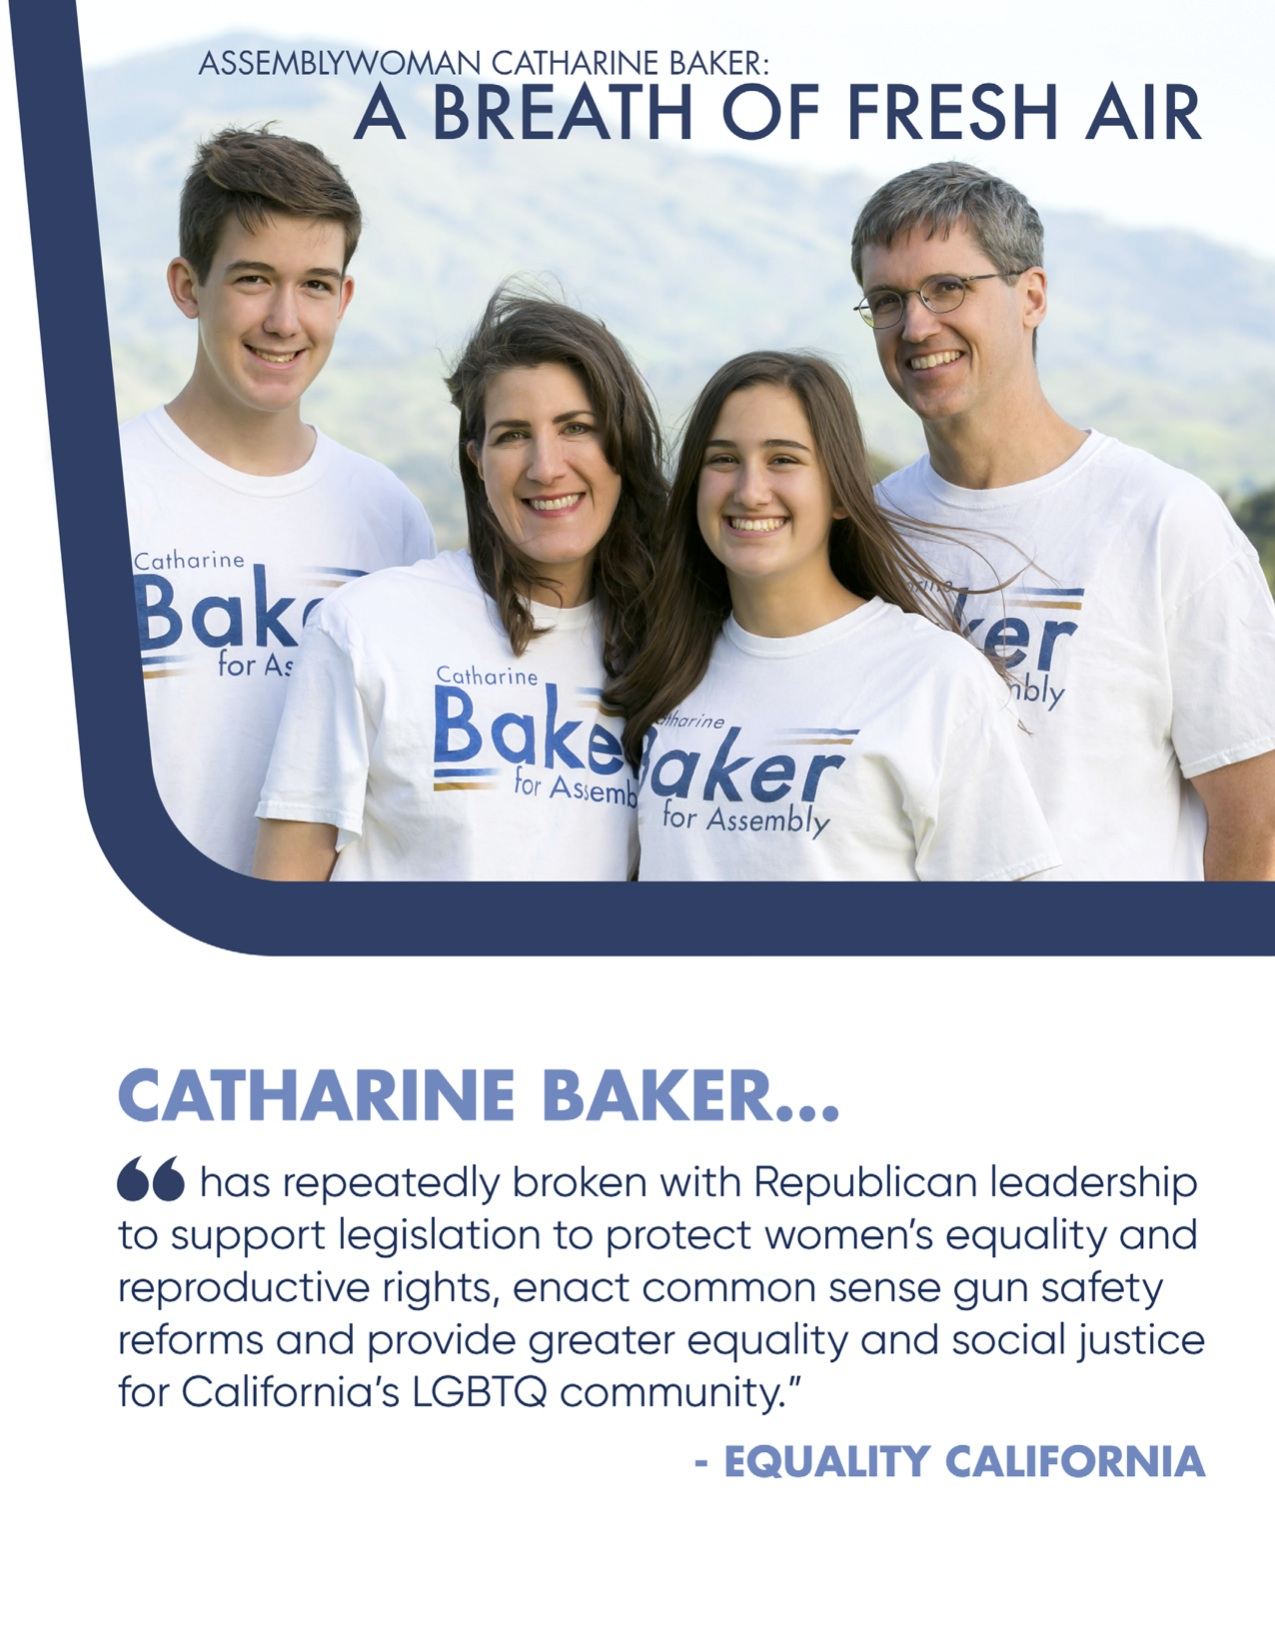 Baker-02BipartisanshipWorks-FINAL (1).jpg